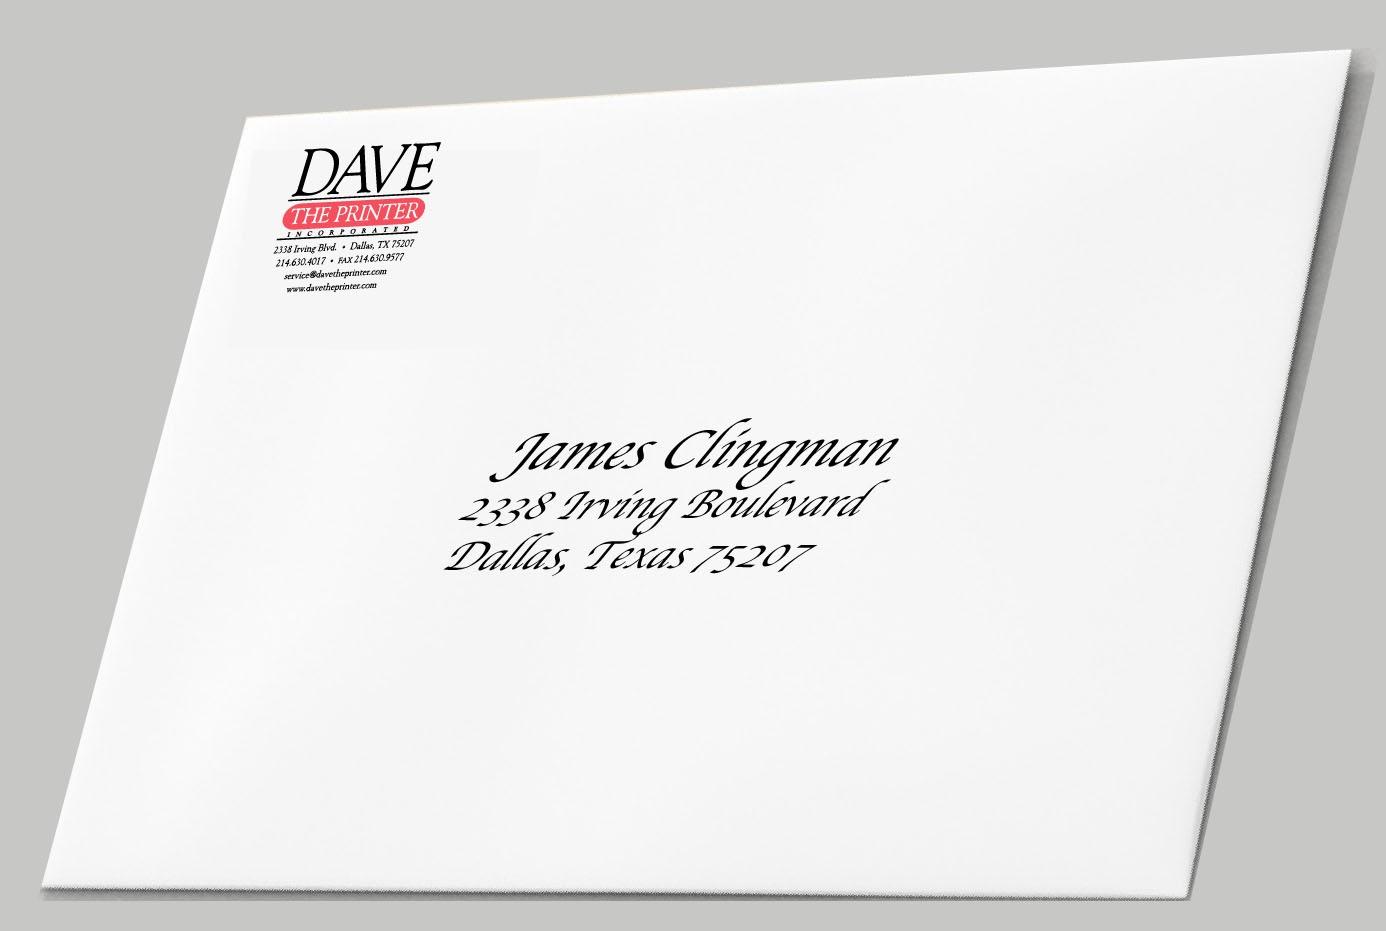 Envelope Printed By Dave The Printer